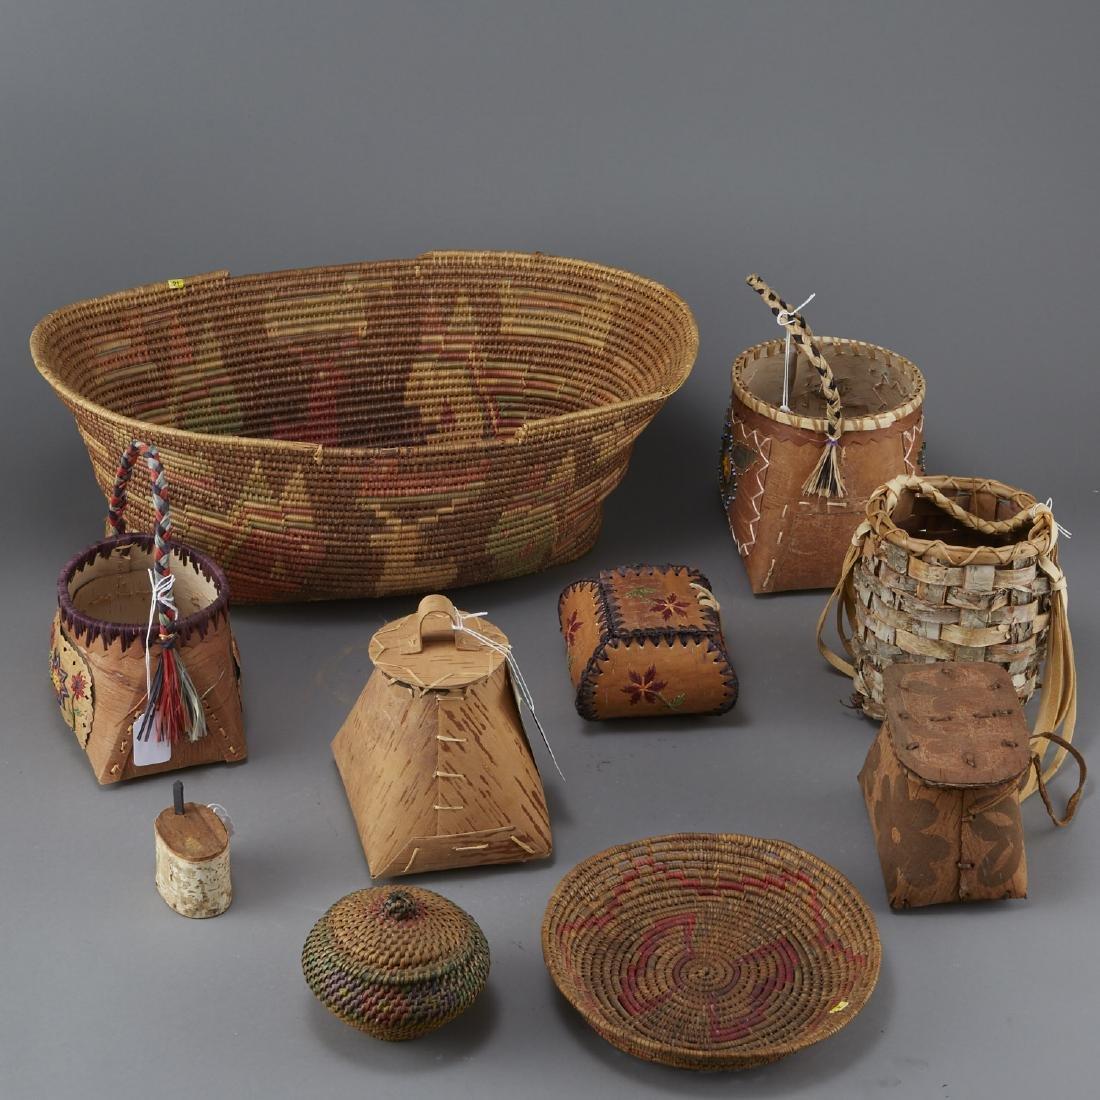 Group of 10 Ojibwe Birchbark and Coiled Baskets